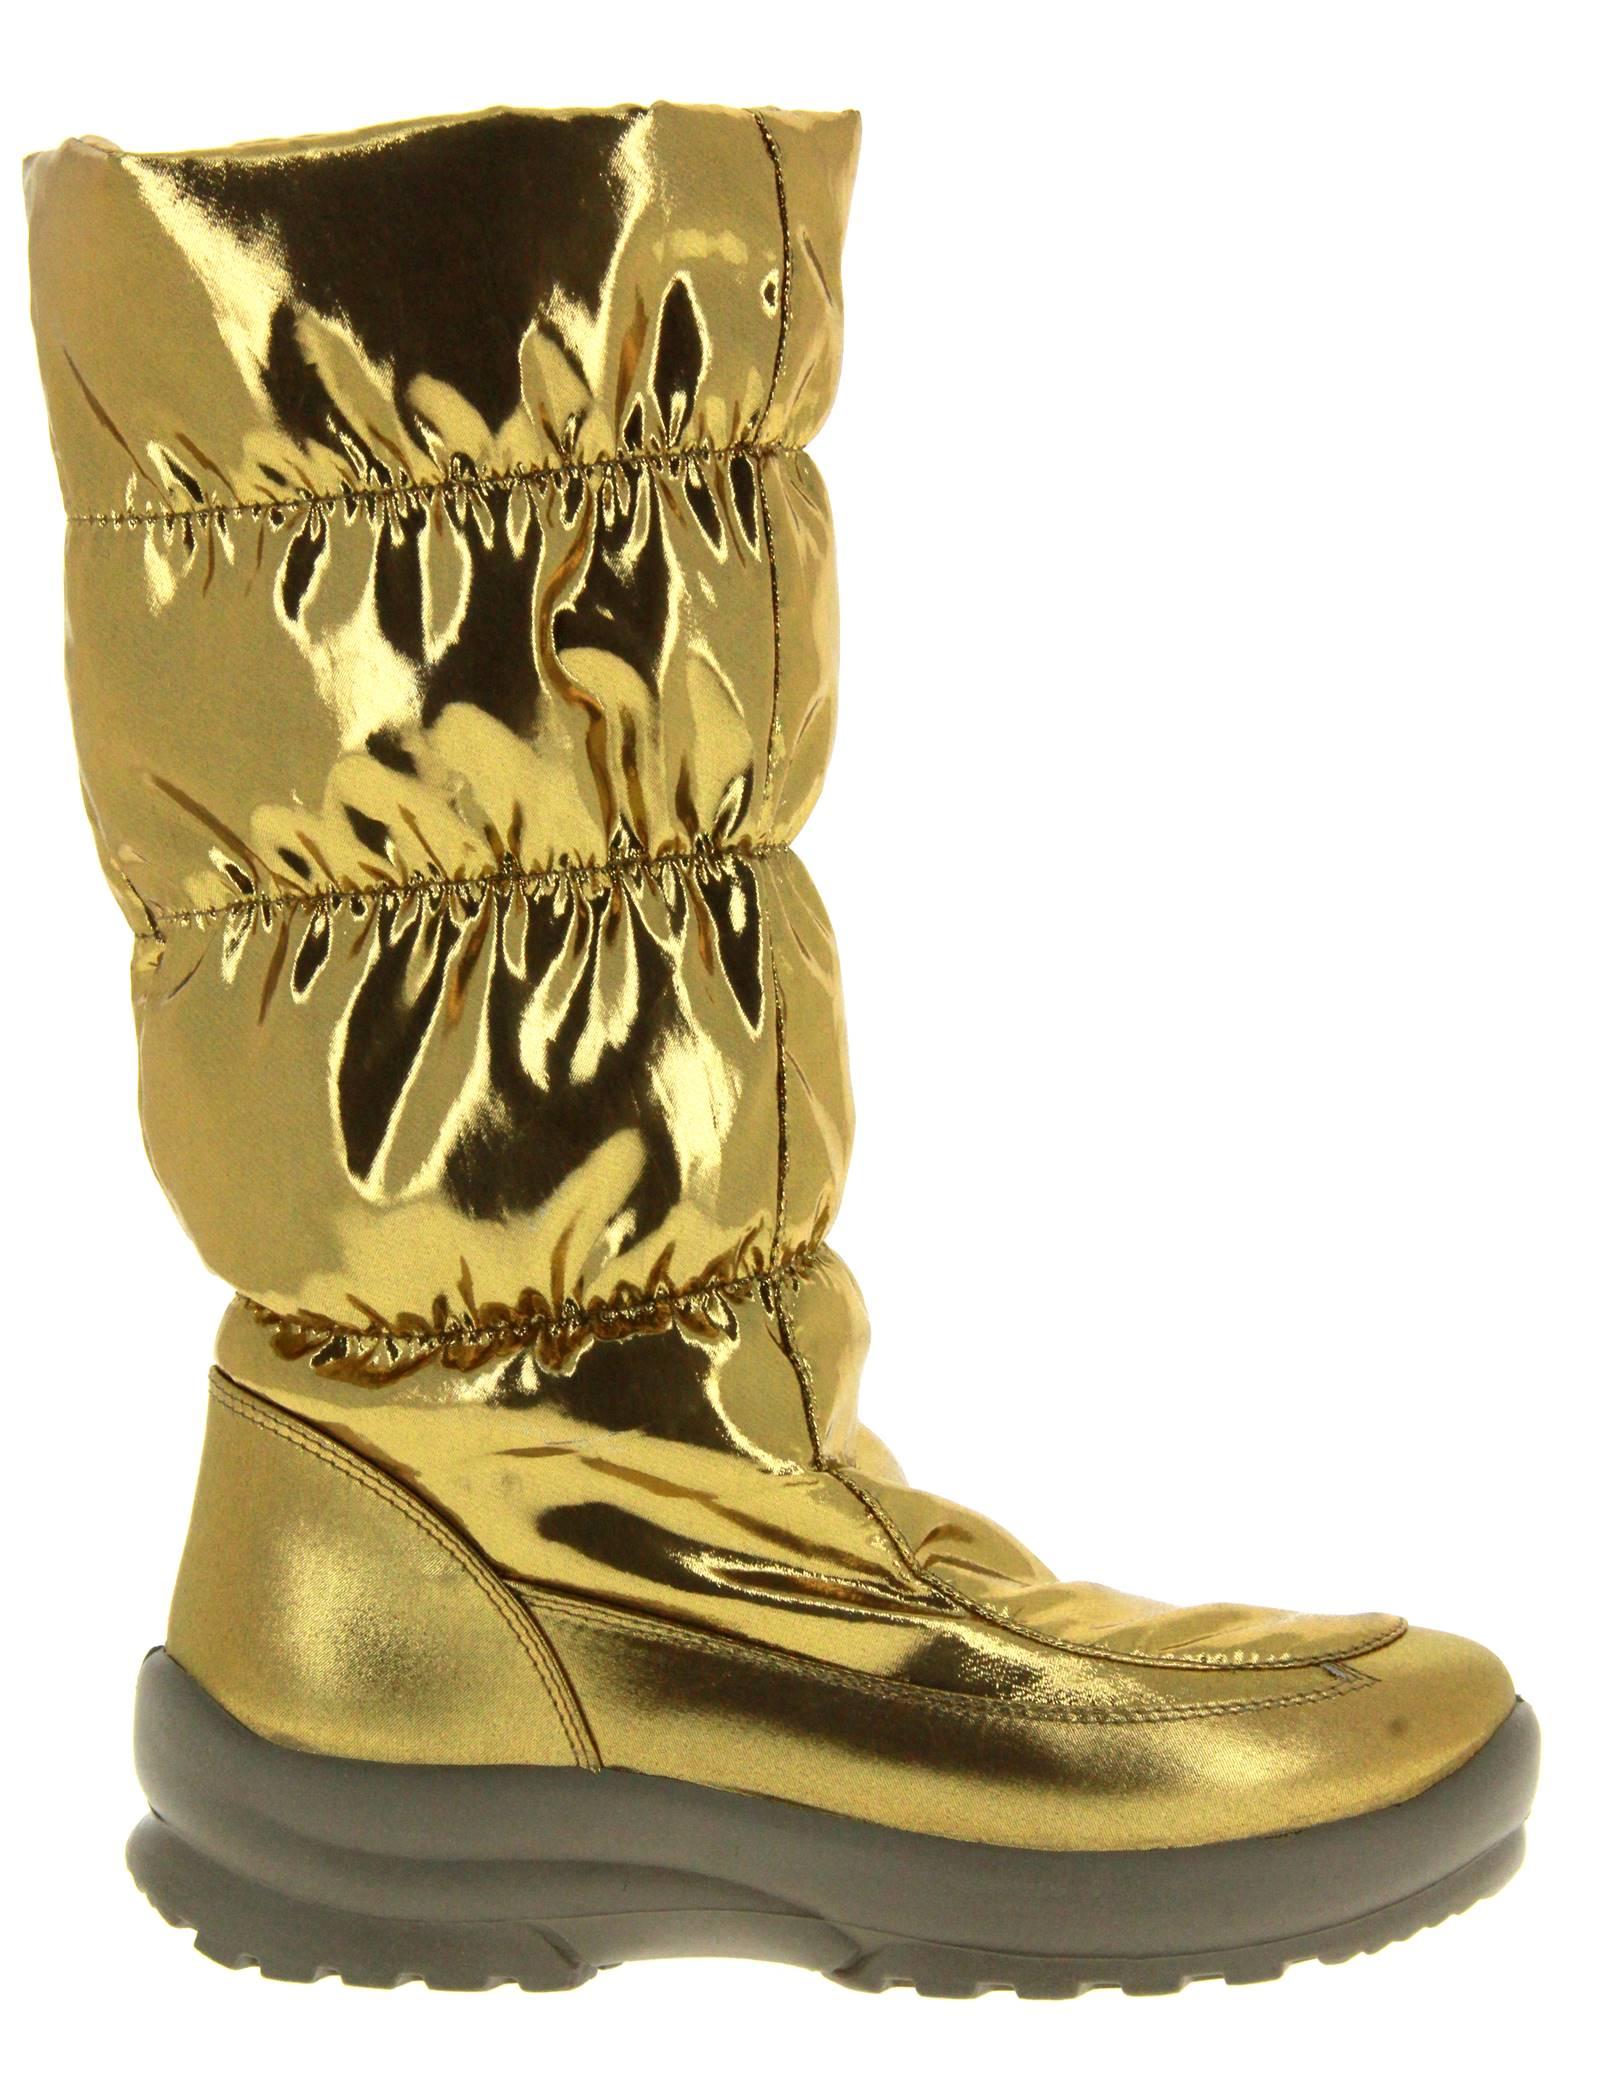 San Bernardo Texstiefel GOLD (39)